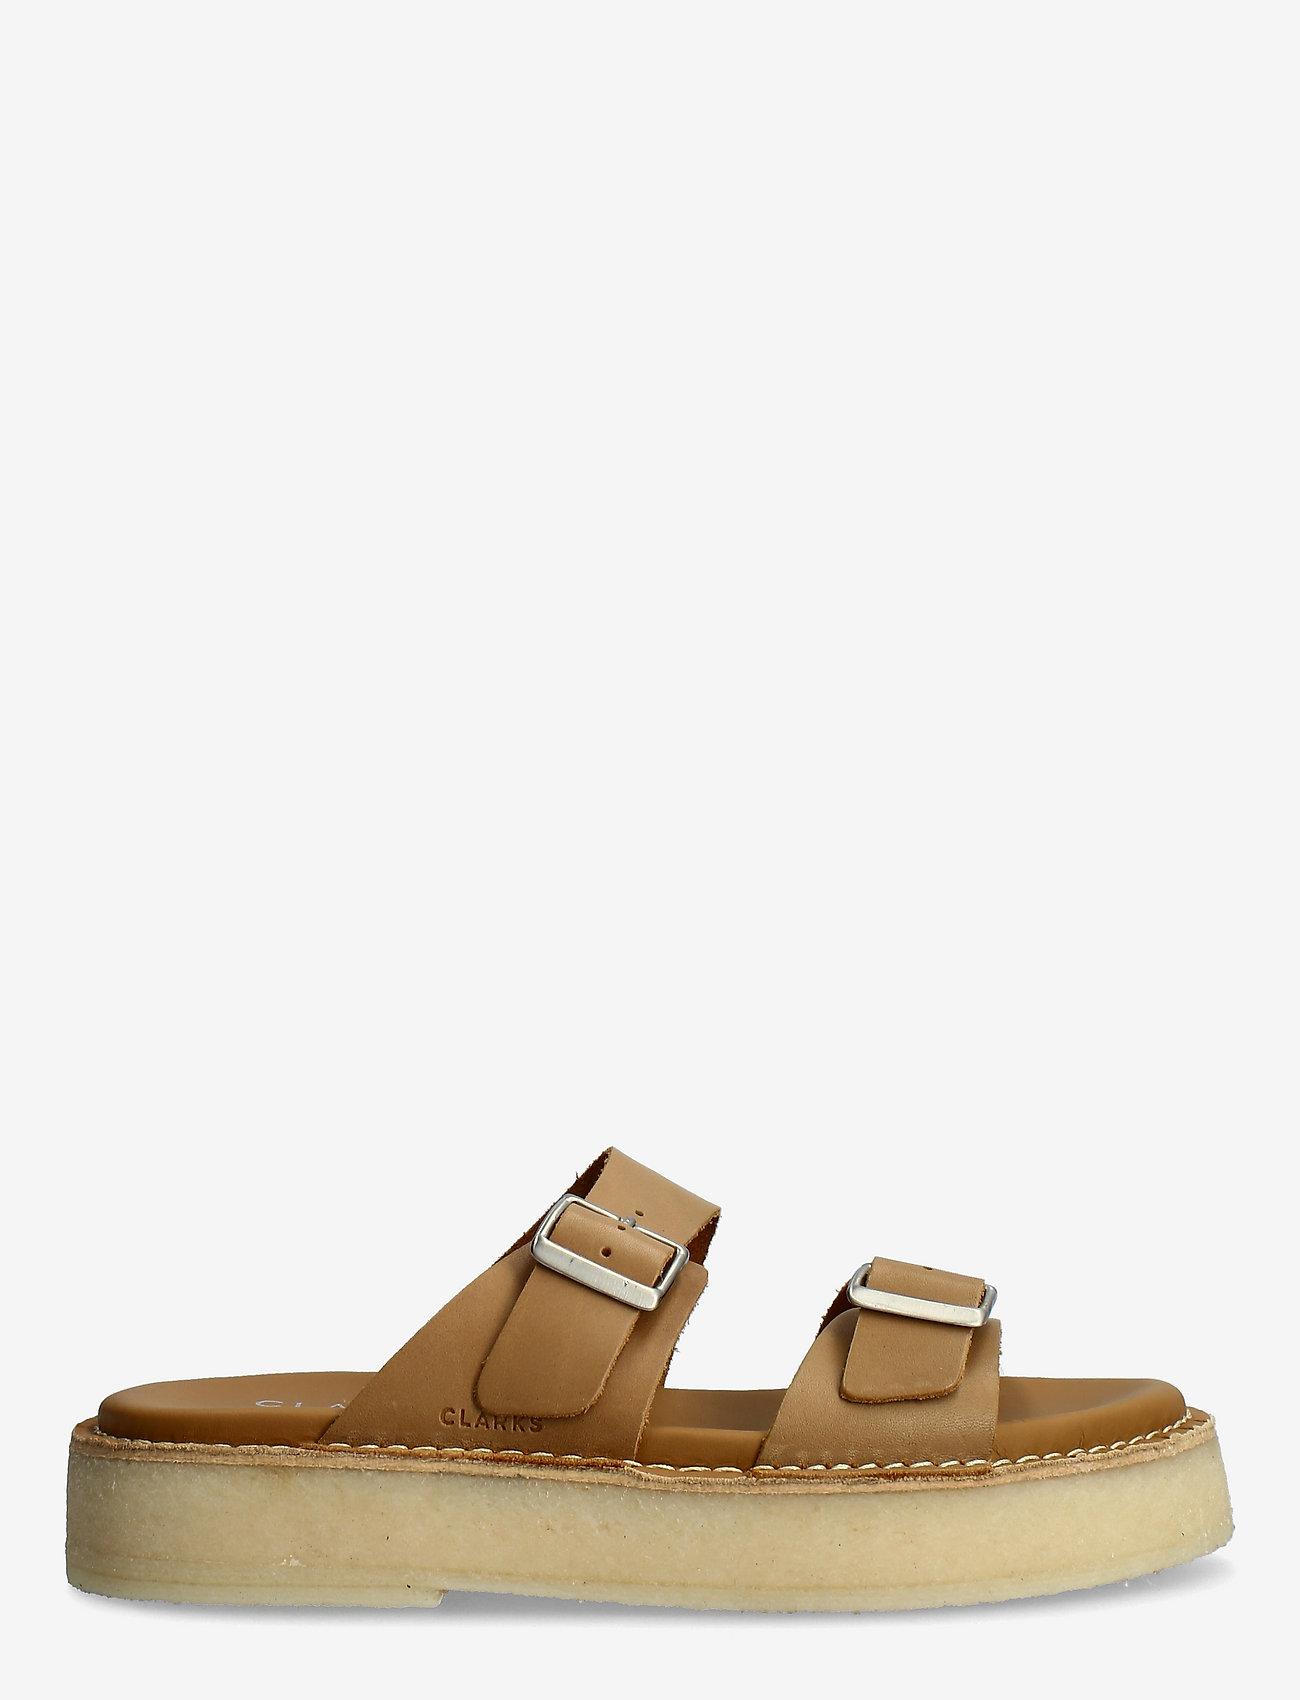 Clarks Originals - Desert Sndl - platta sandaler - tan leather - 1